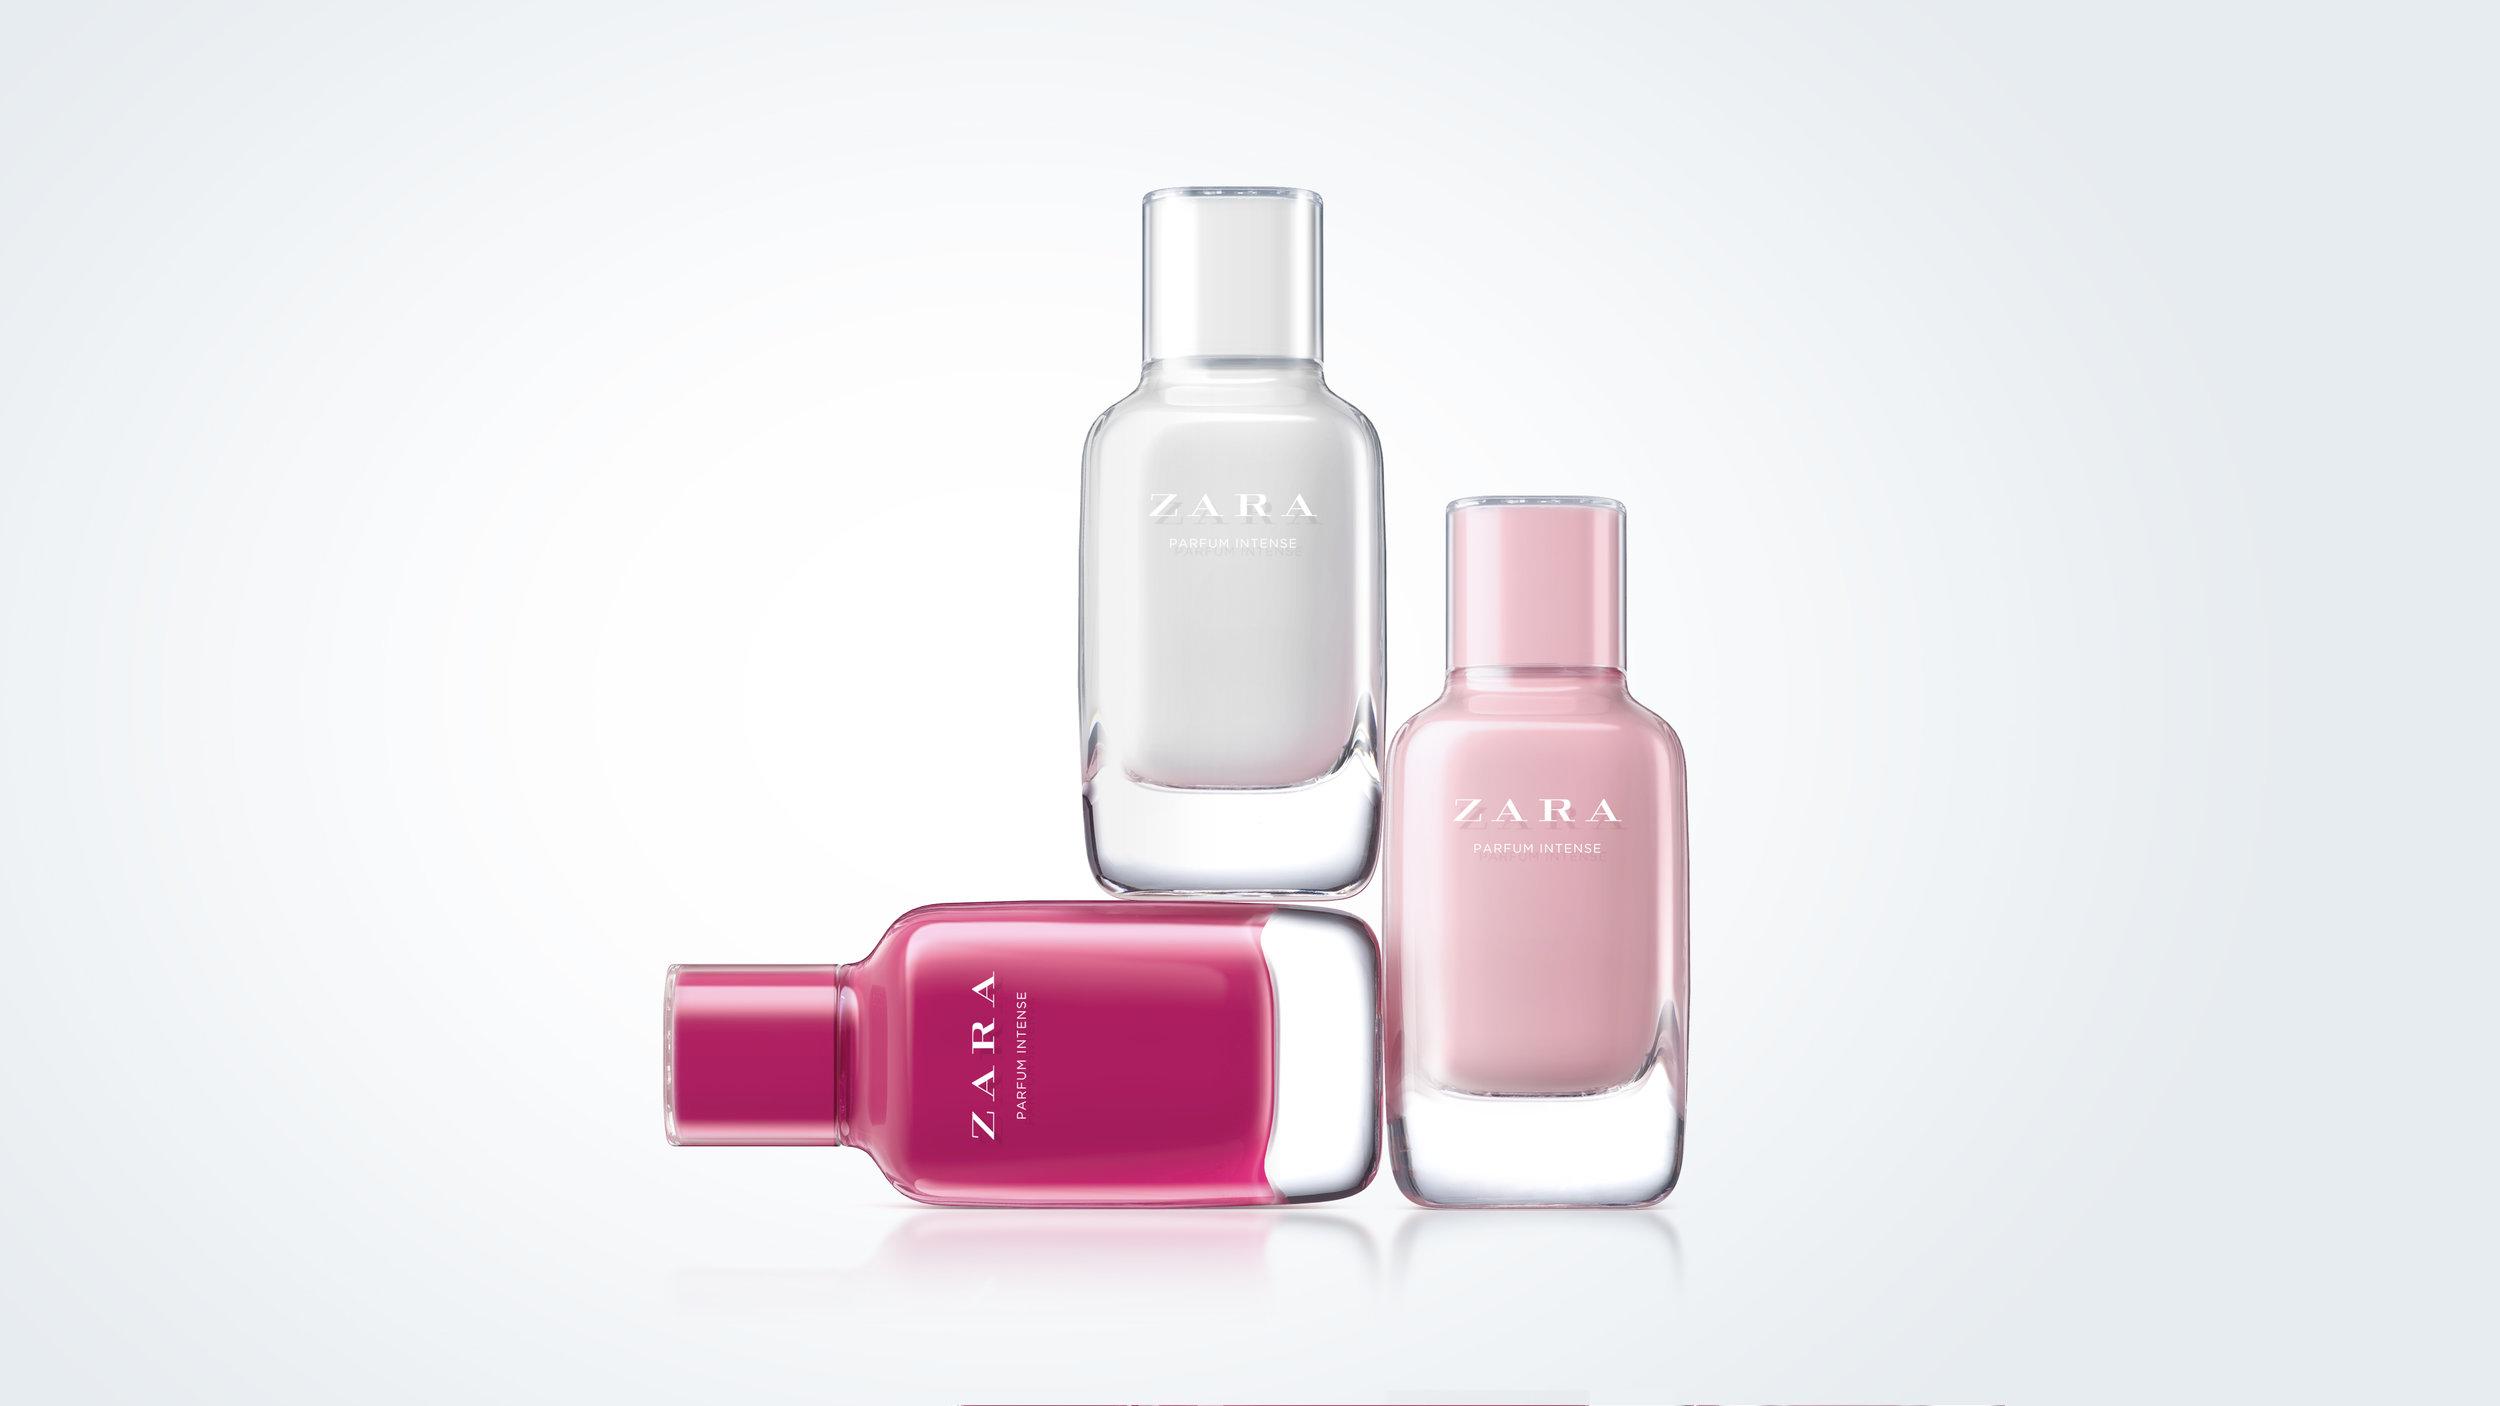 Lavernia & Cienfuegos - Zara Parfum Intense7.jpg